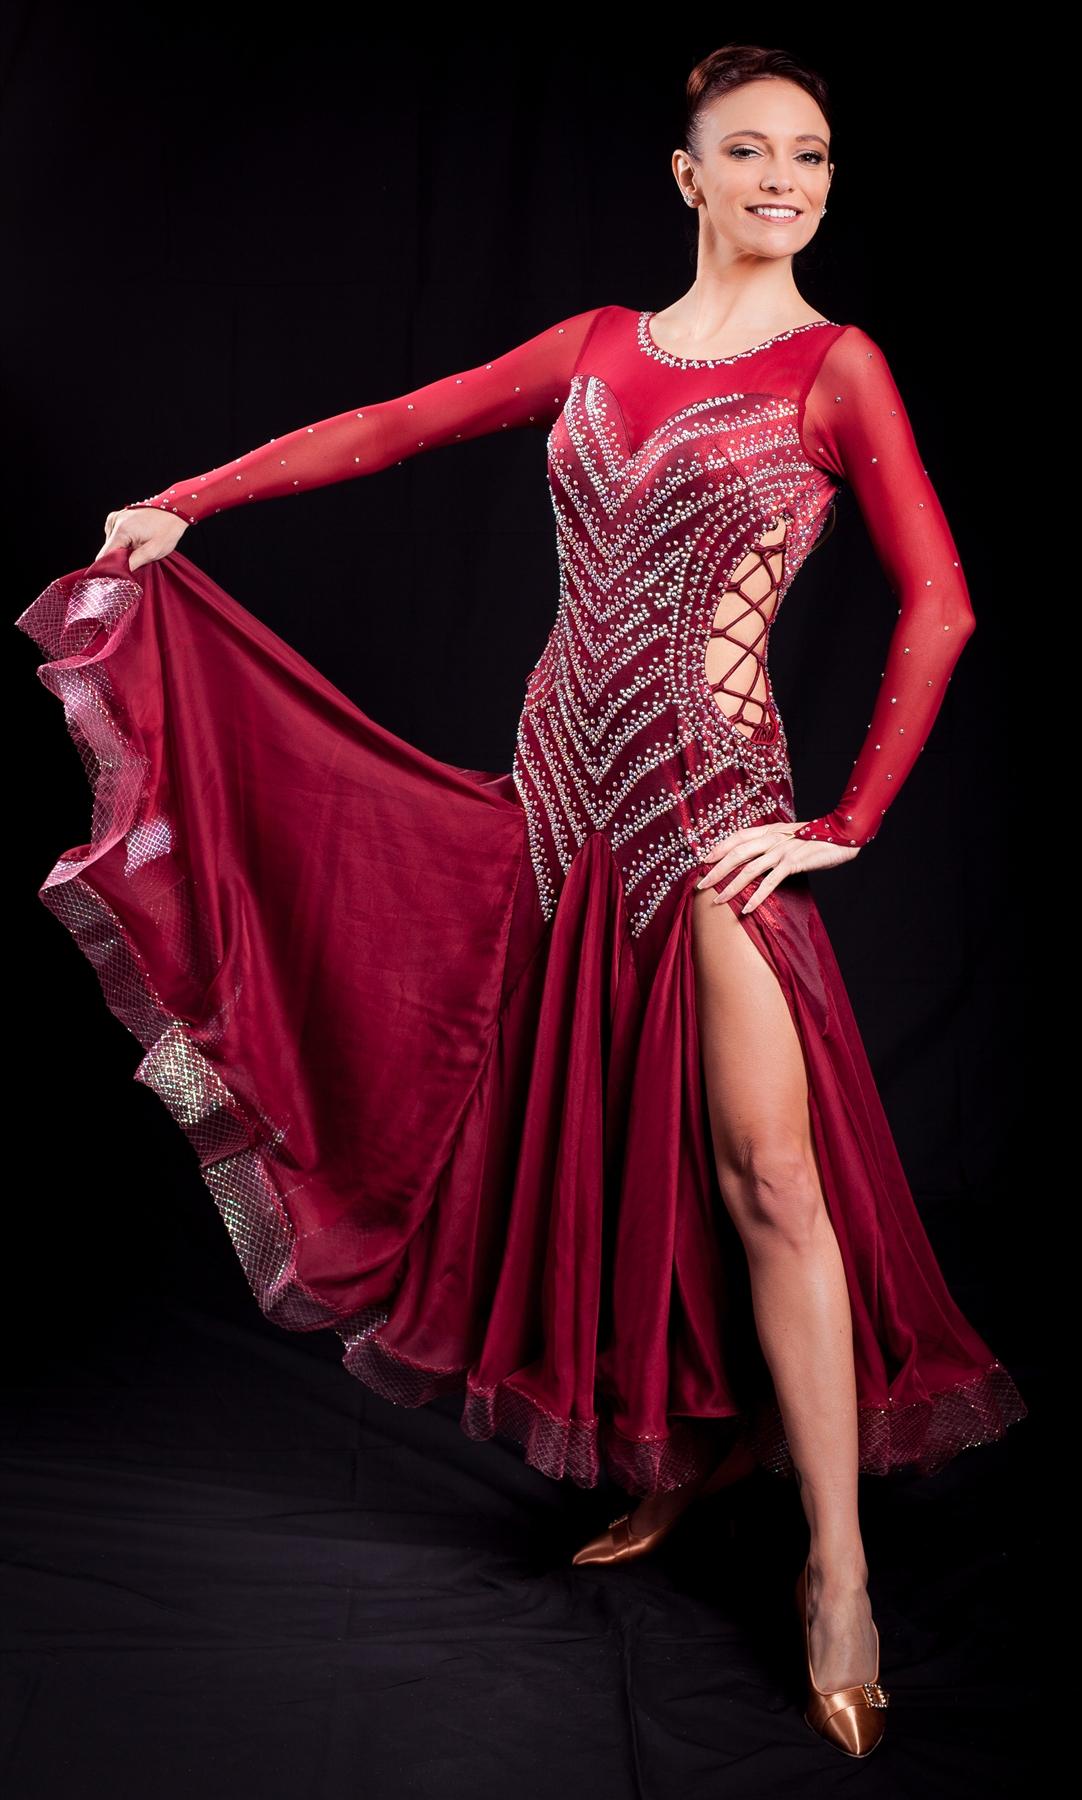 74c596410daab Elegant & Sexy Burgundy Ballroom Dress Larger Photo ...